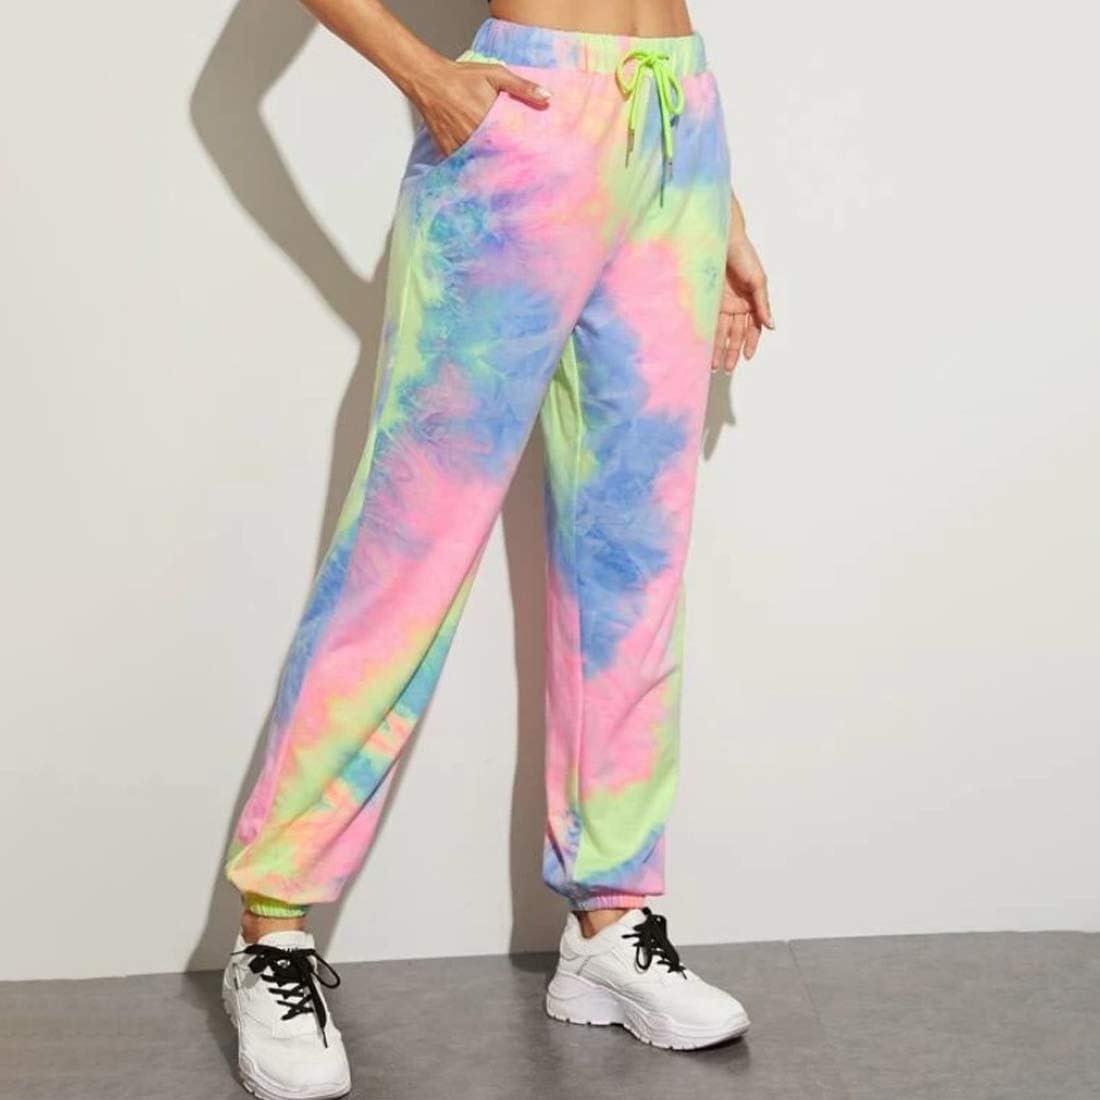 Ai.Moichien Pantaloni Sportivi Elastici da Donna Pantaloni Stile Harem con Stampa Tie Dye